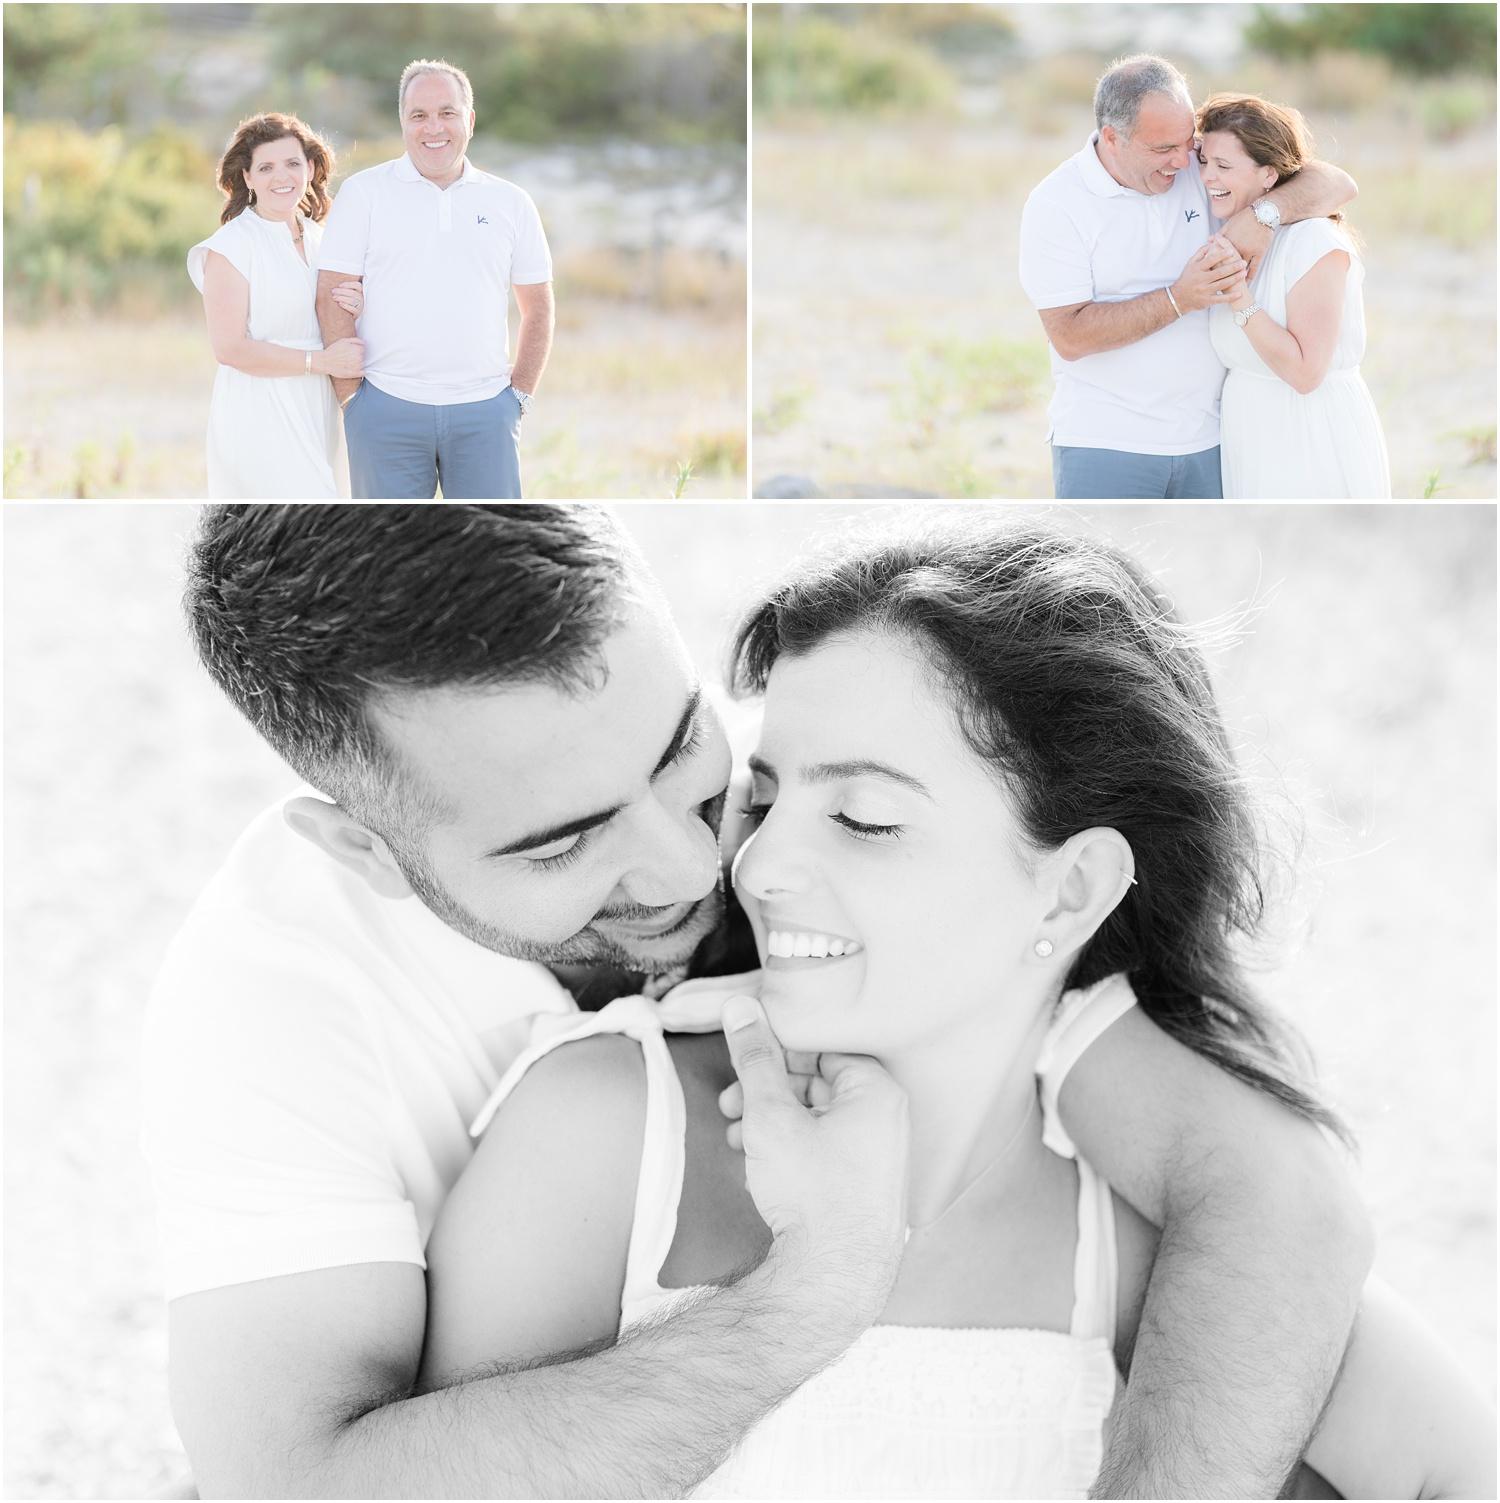 Romantic couples photos on the beach in LBI